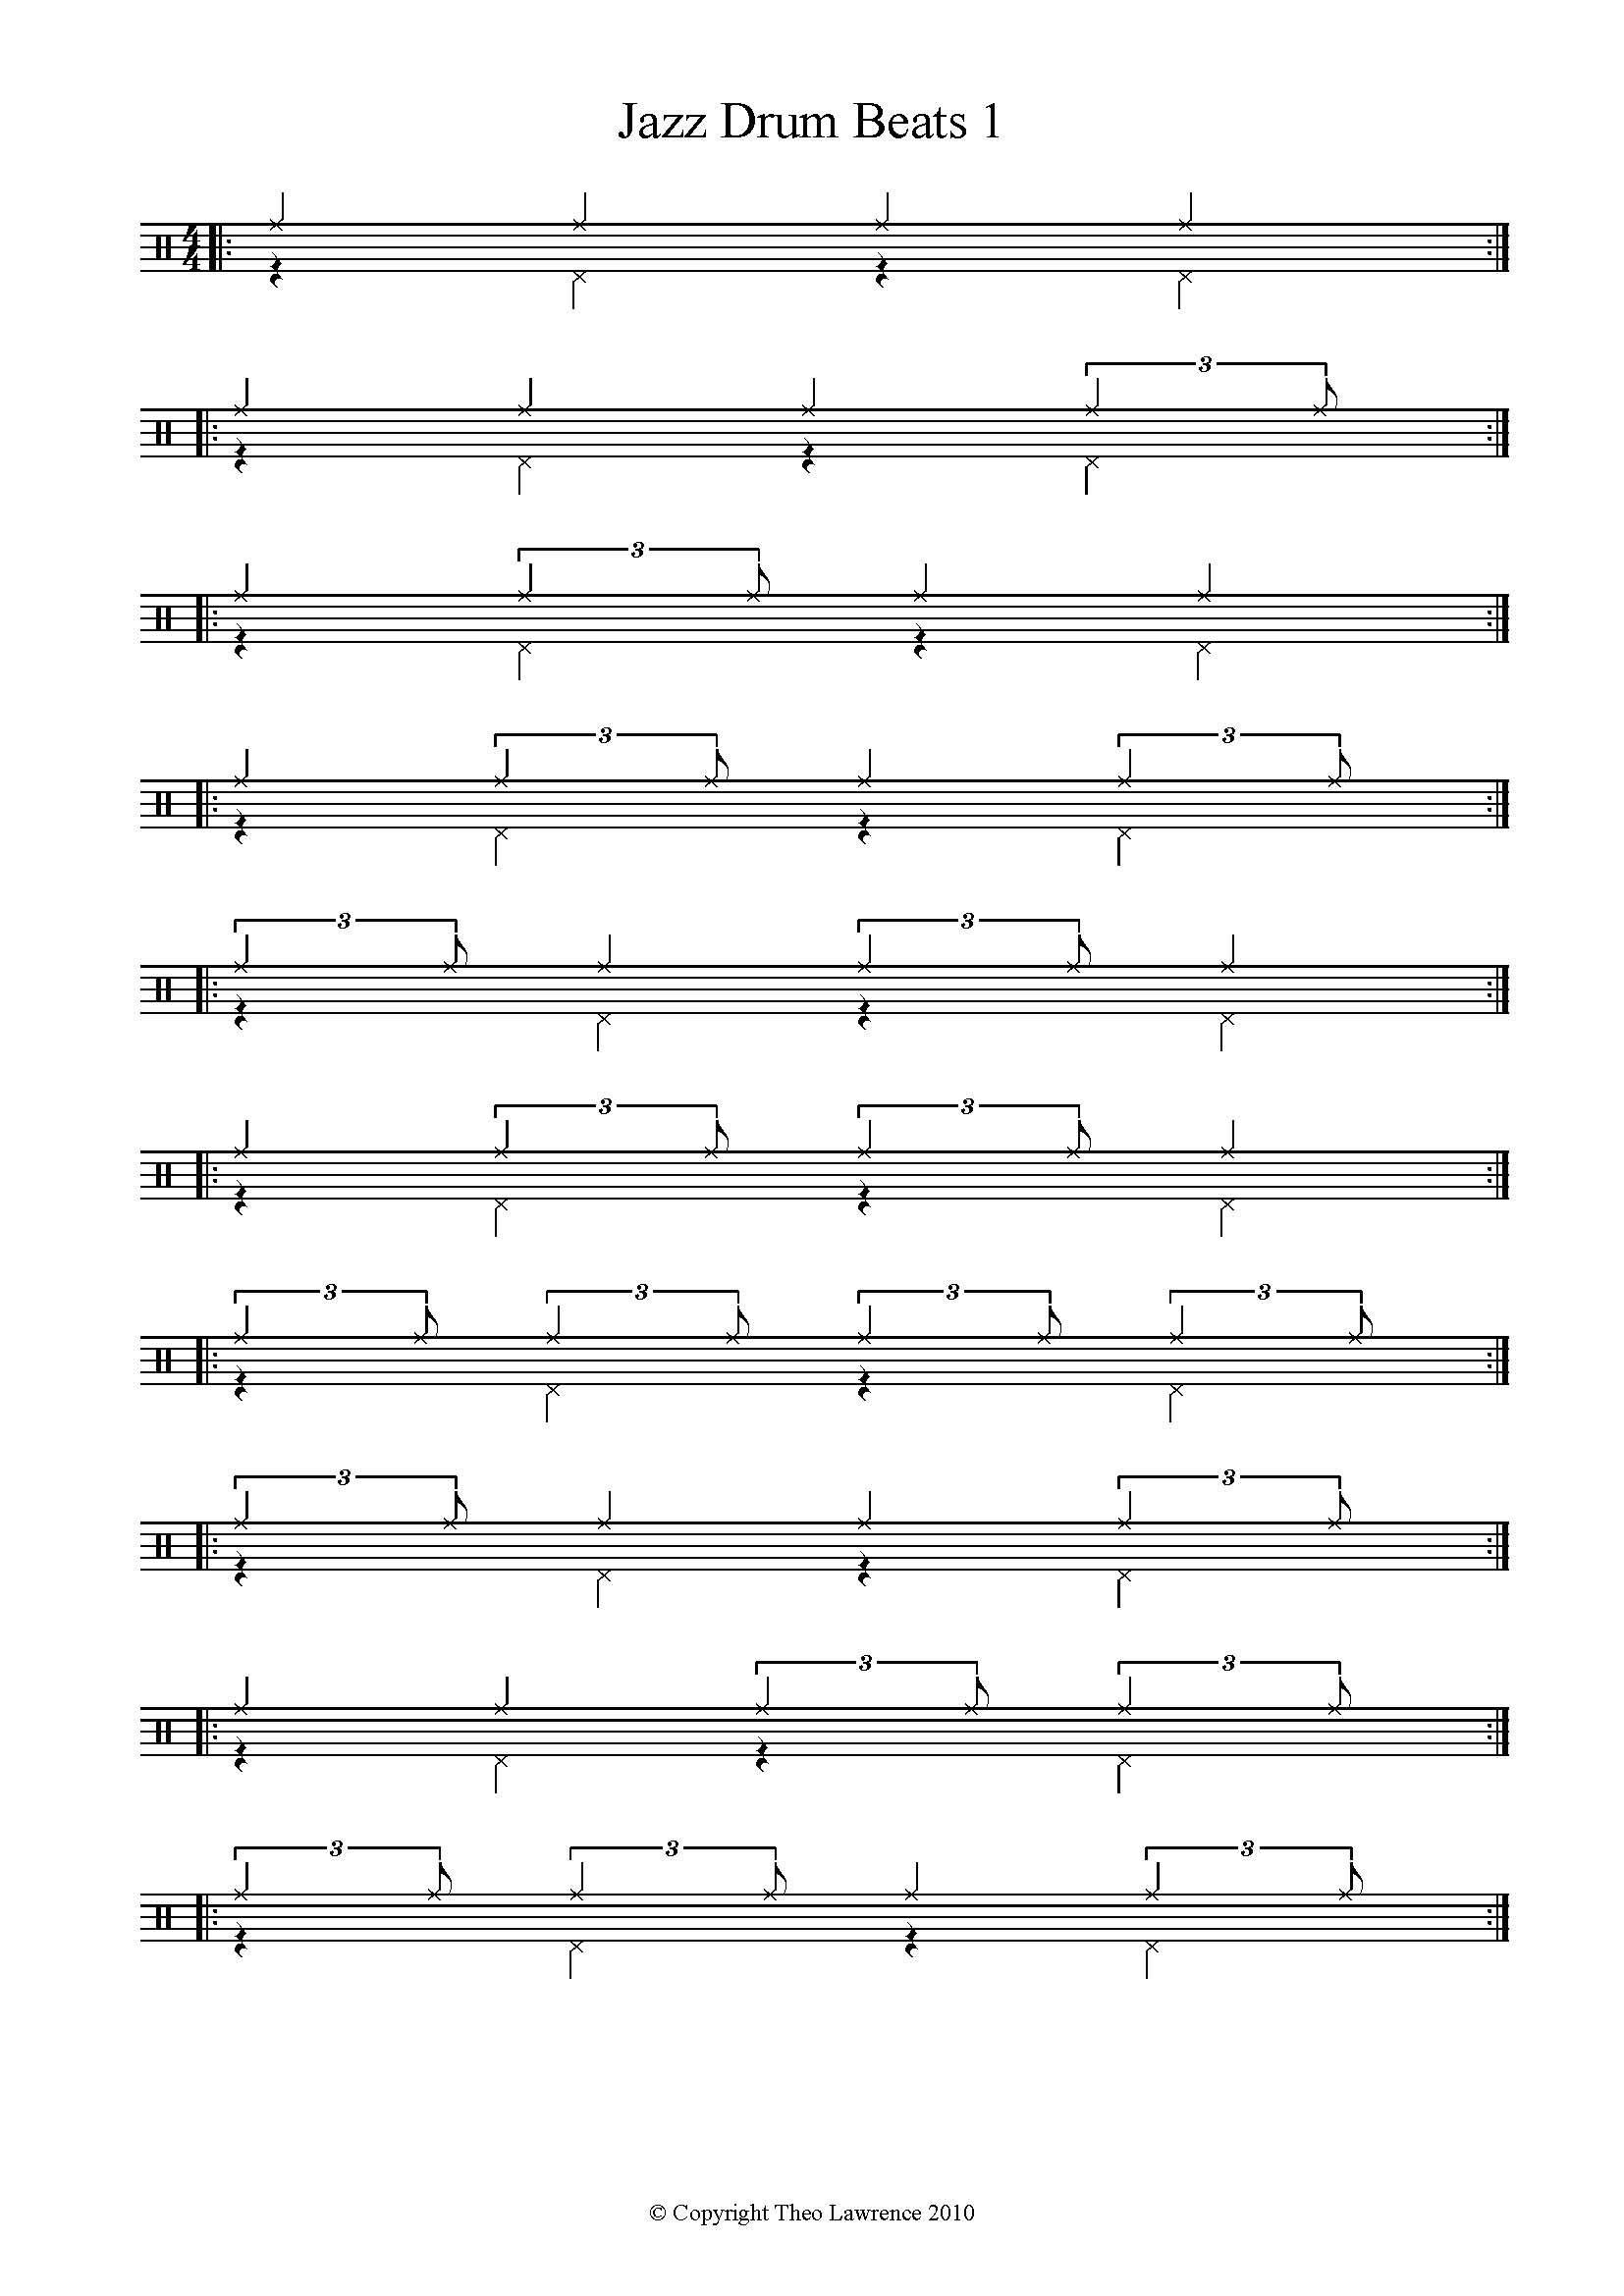 Basic Jazz Drum Patterns